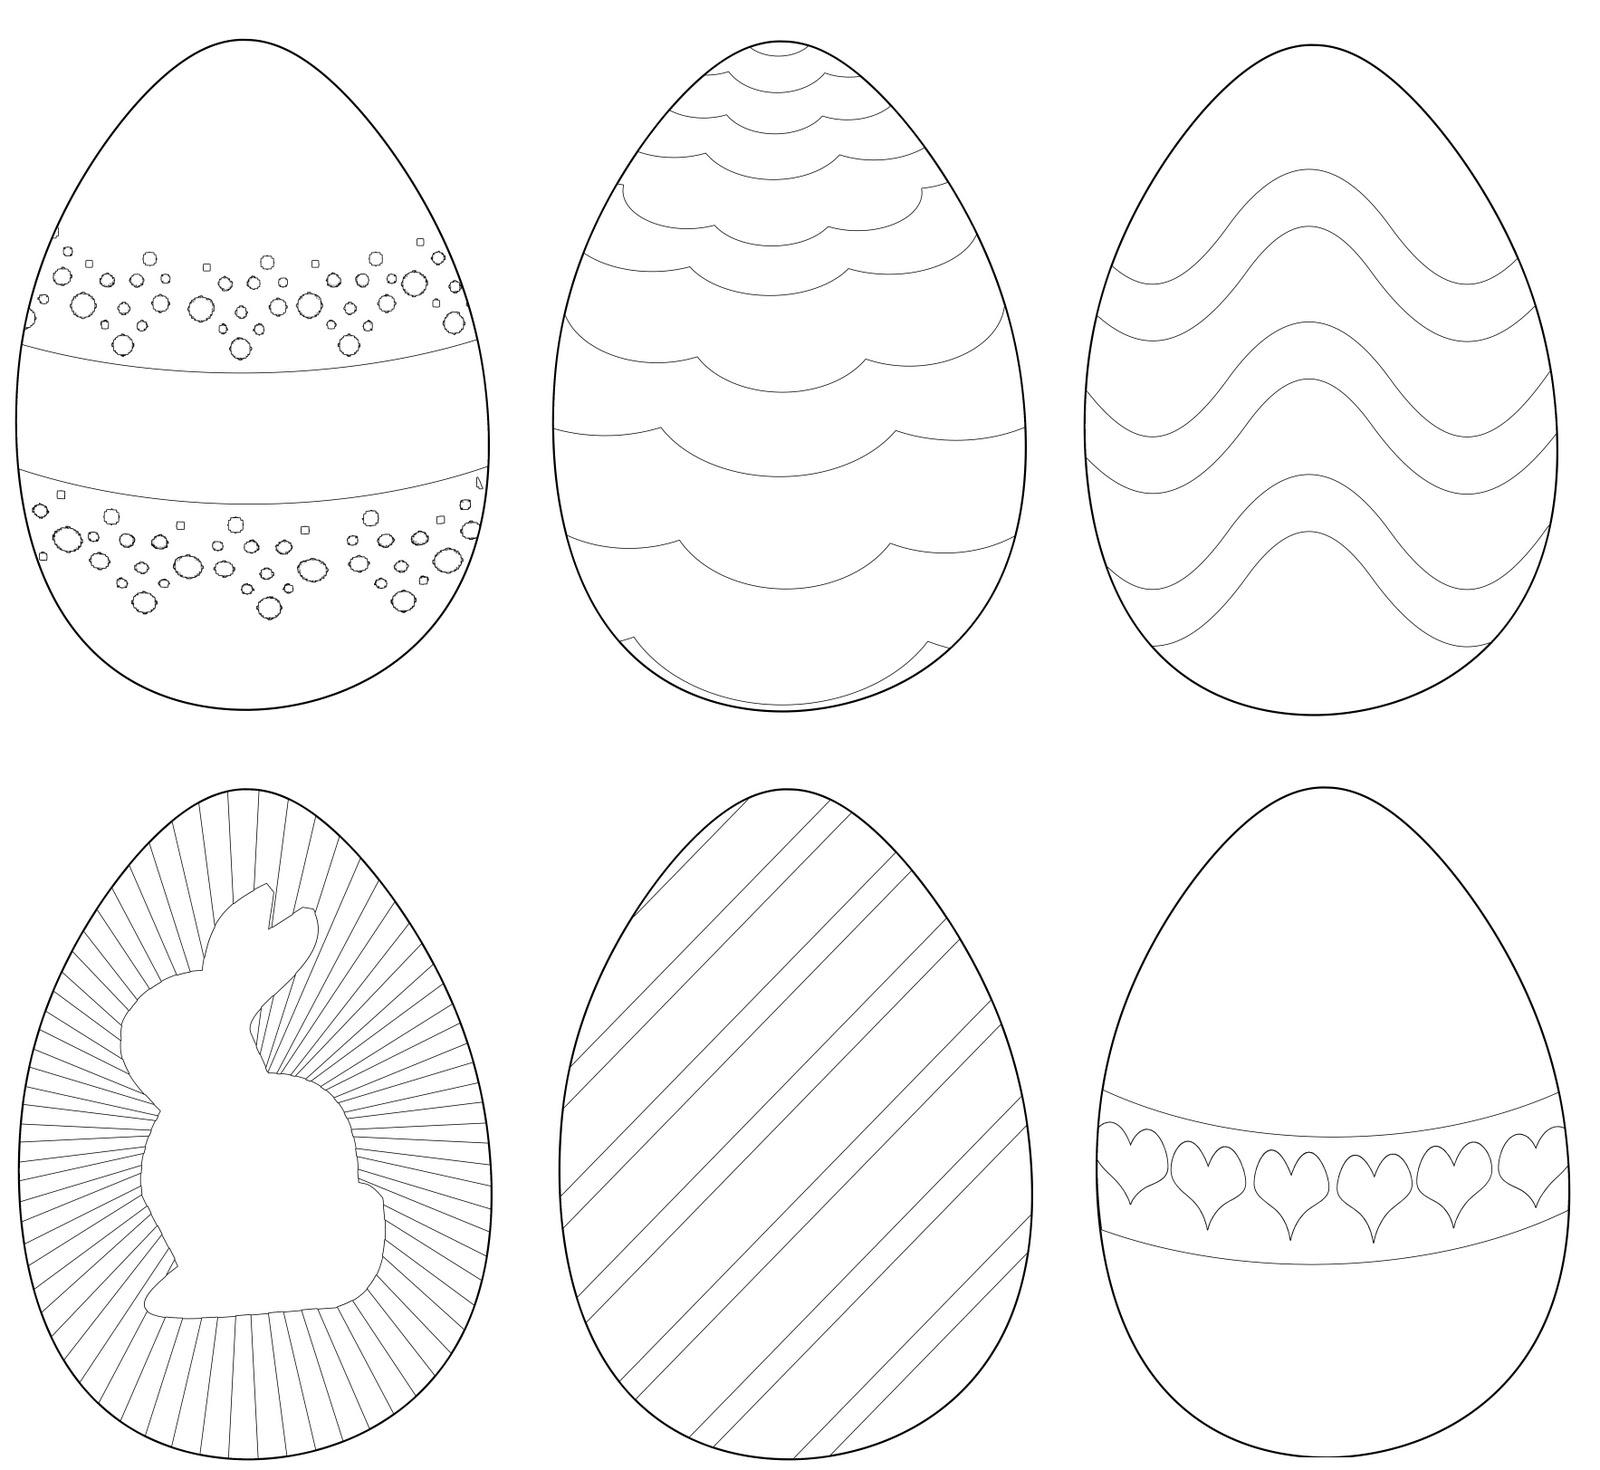 Fichas De Ingles Para Ninos Huevos De Pascua Para Colorear